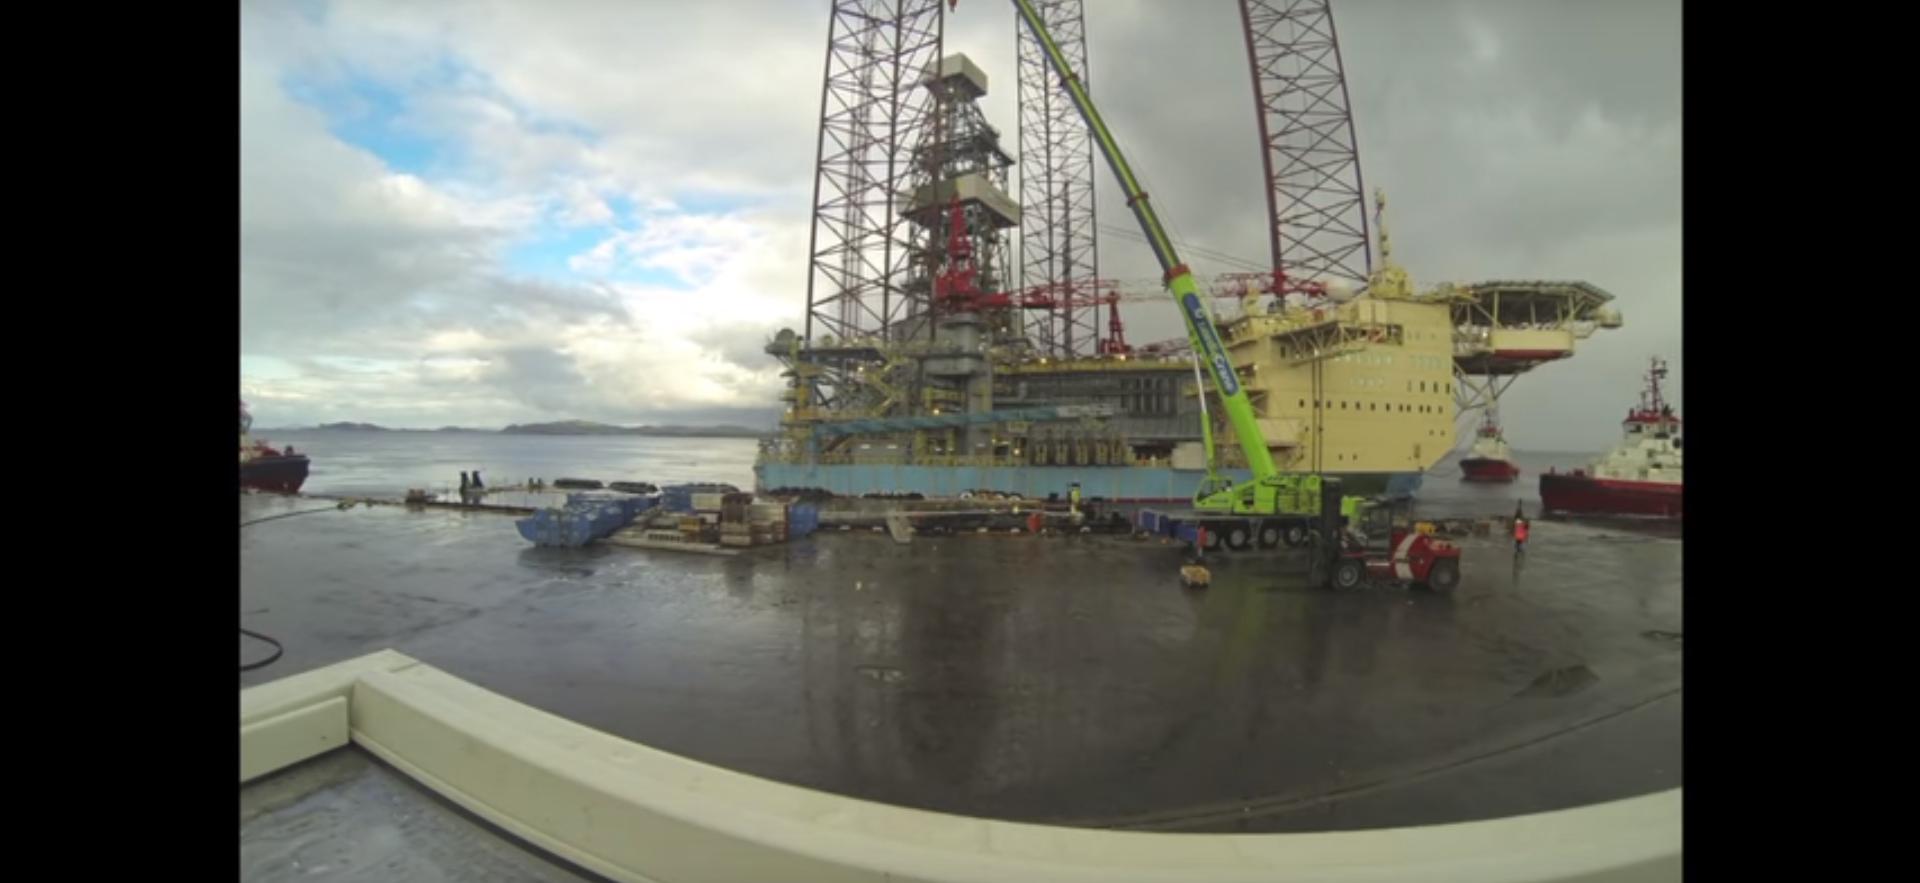 Video: Timelapse of worlds largest jack-up rig